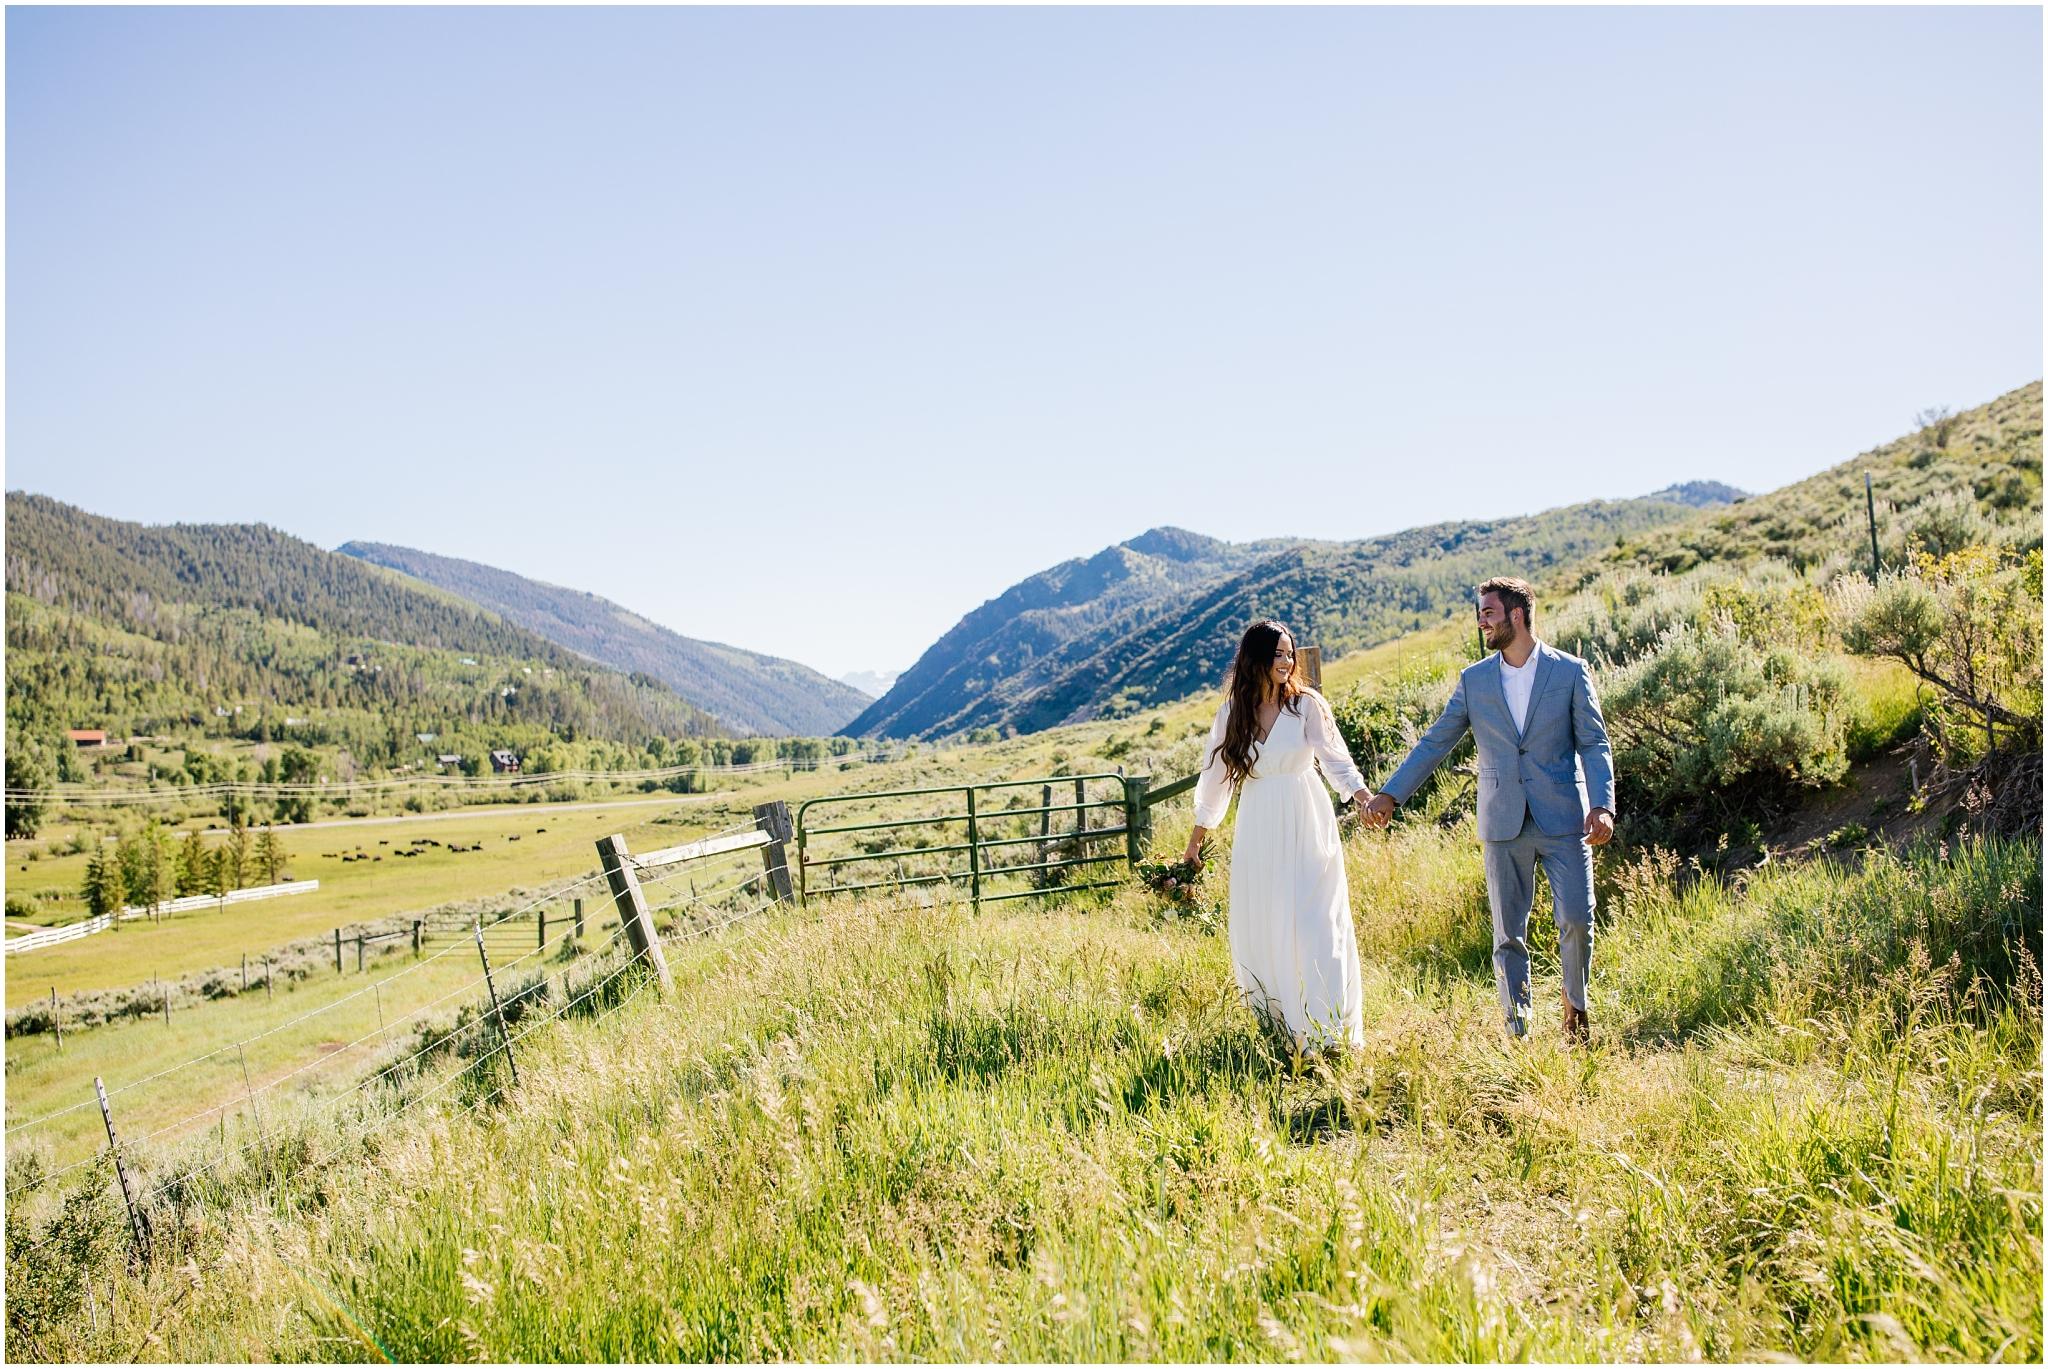 MountainShoot-32_Lizzie-B-Imagery-Utah-Wedding-Photographer-Salt-Lake-City-Park-City-Utah-County.jpg